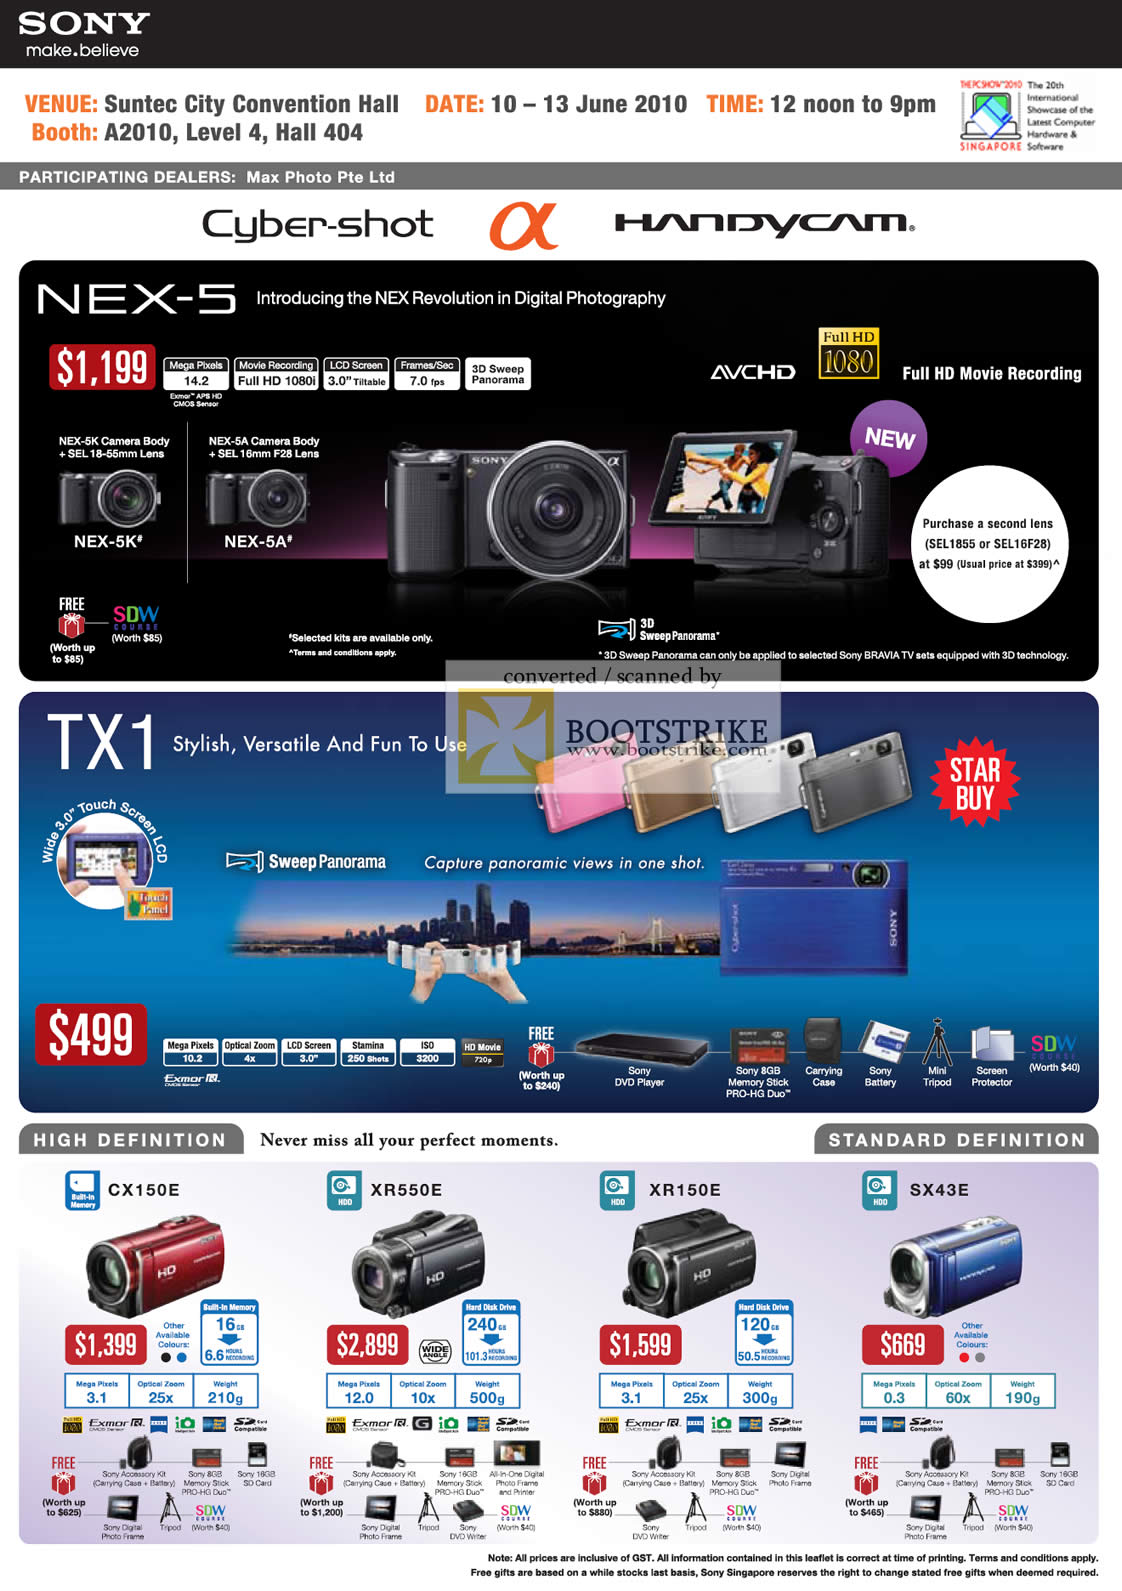 sony camera cybershot price list. pc show 2010 price list image brochure of sony alpha cybershot handycam nex 5 5k 5a. « camera